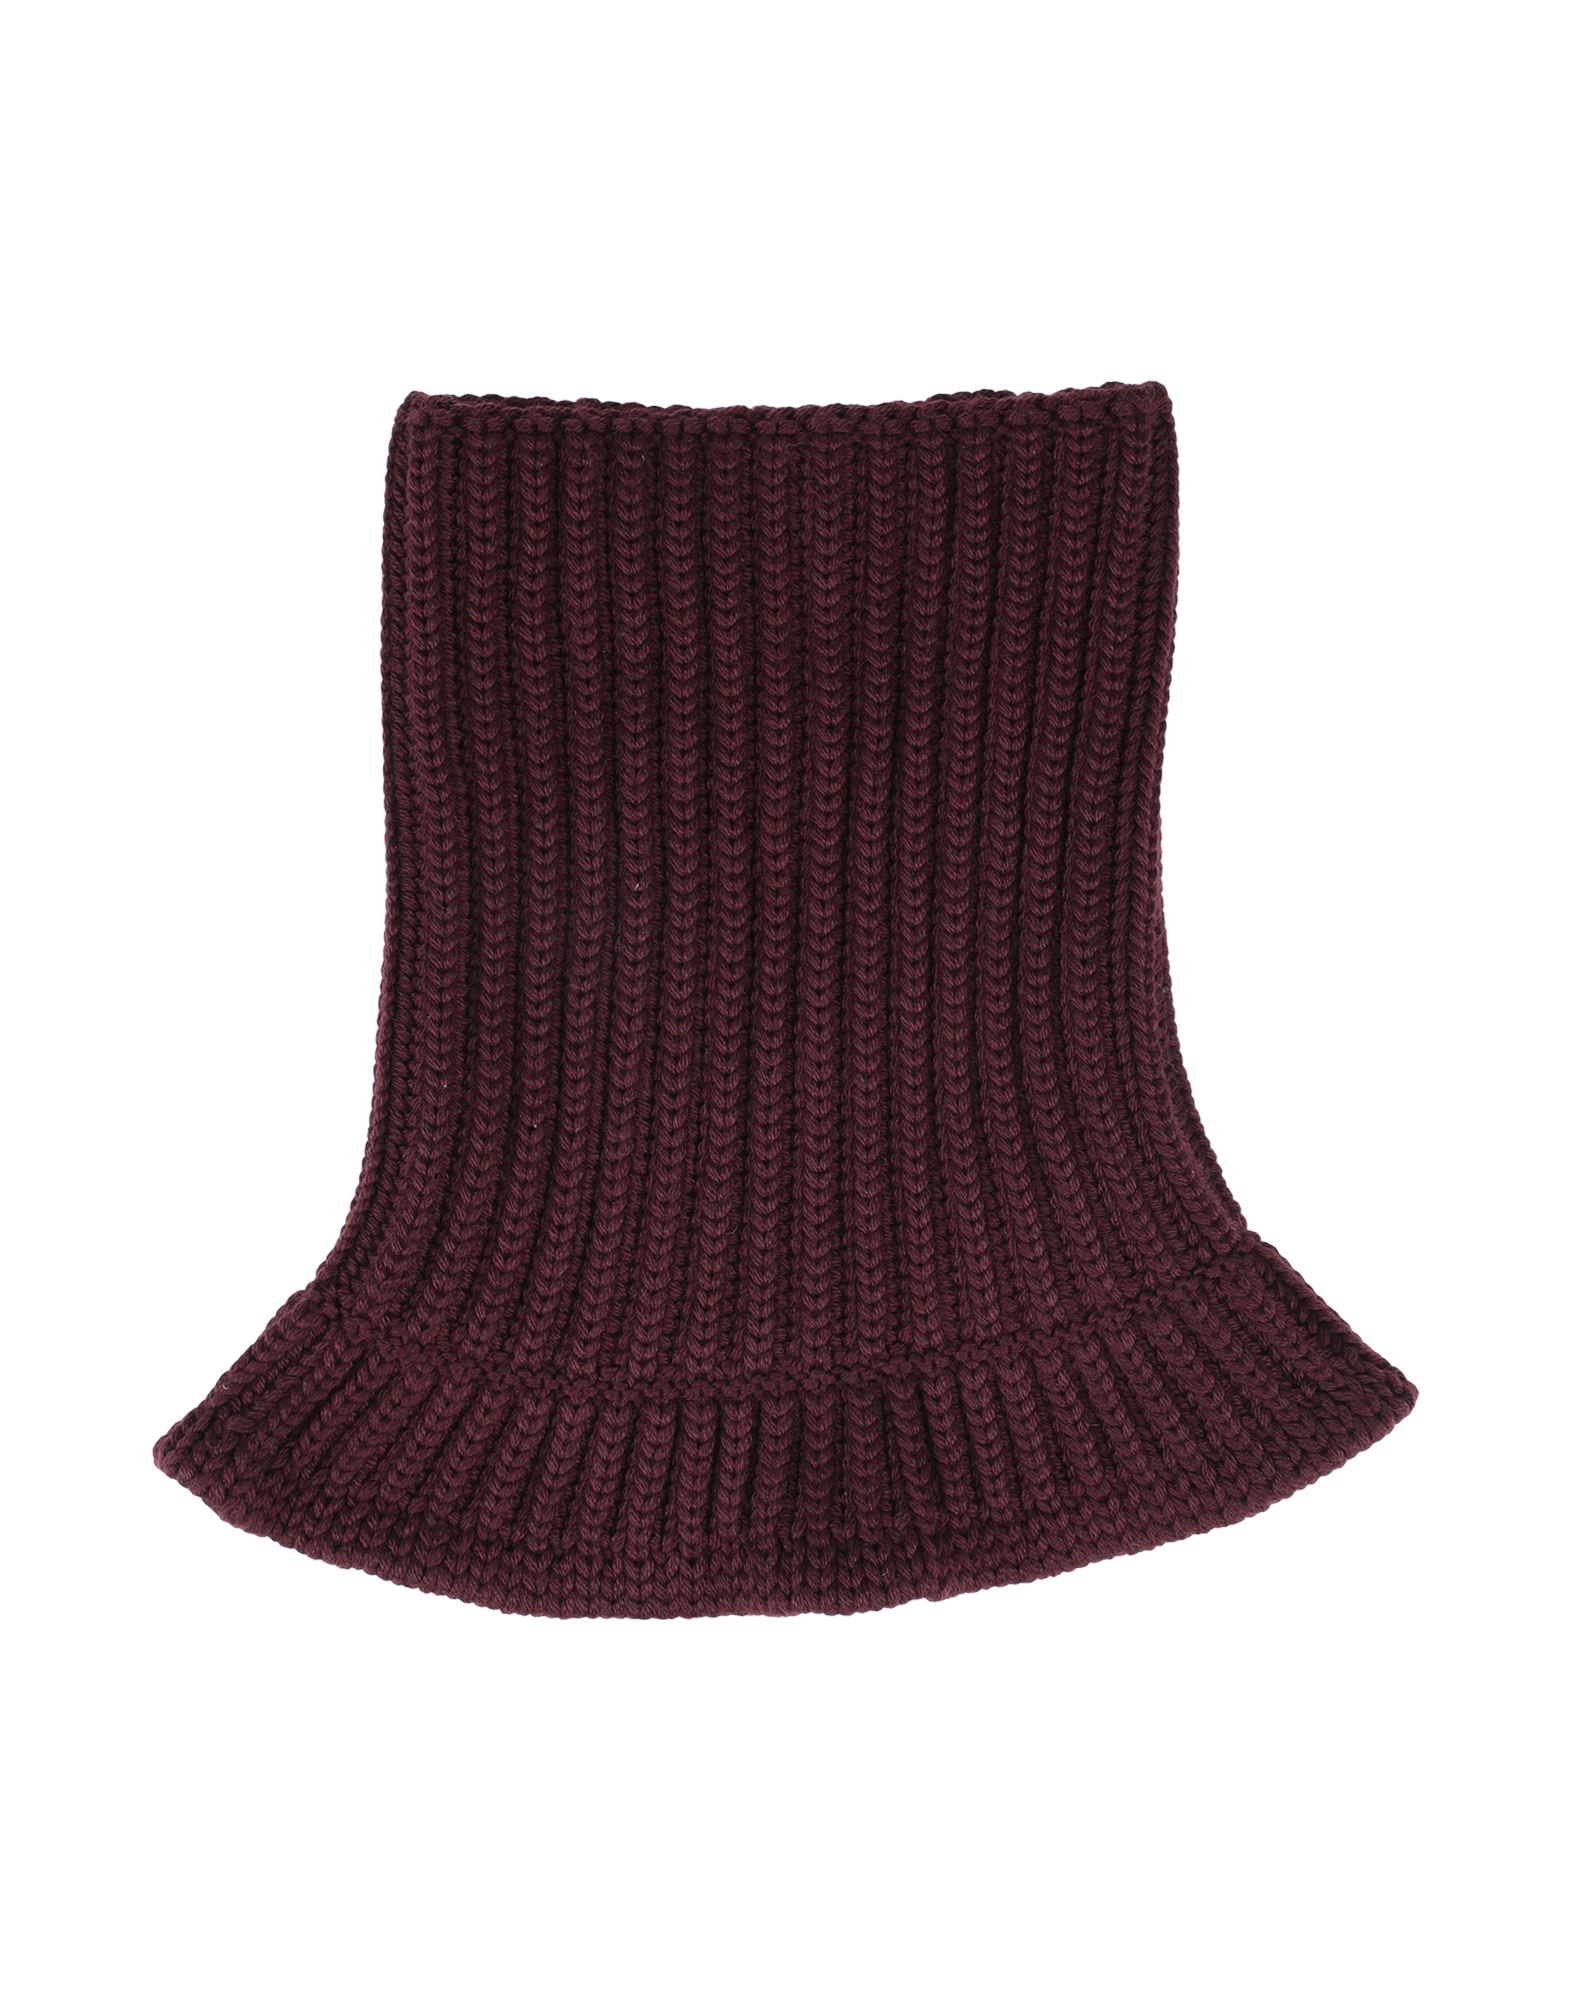 NEIL BARRETT Collars. knitted, no appliqués, basic solid color, medium-weight knit. 50% Merino Wool, 50% Acrylic